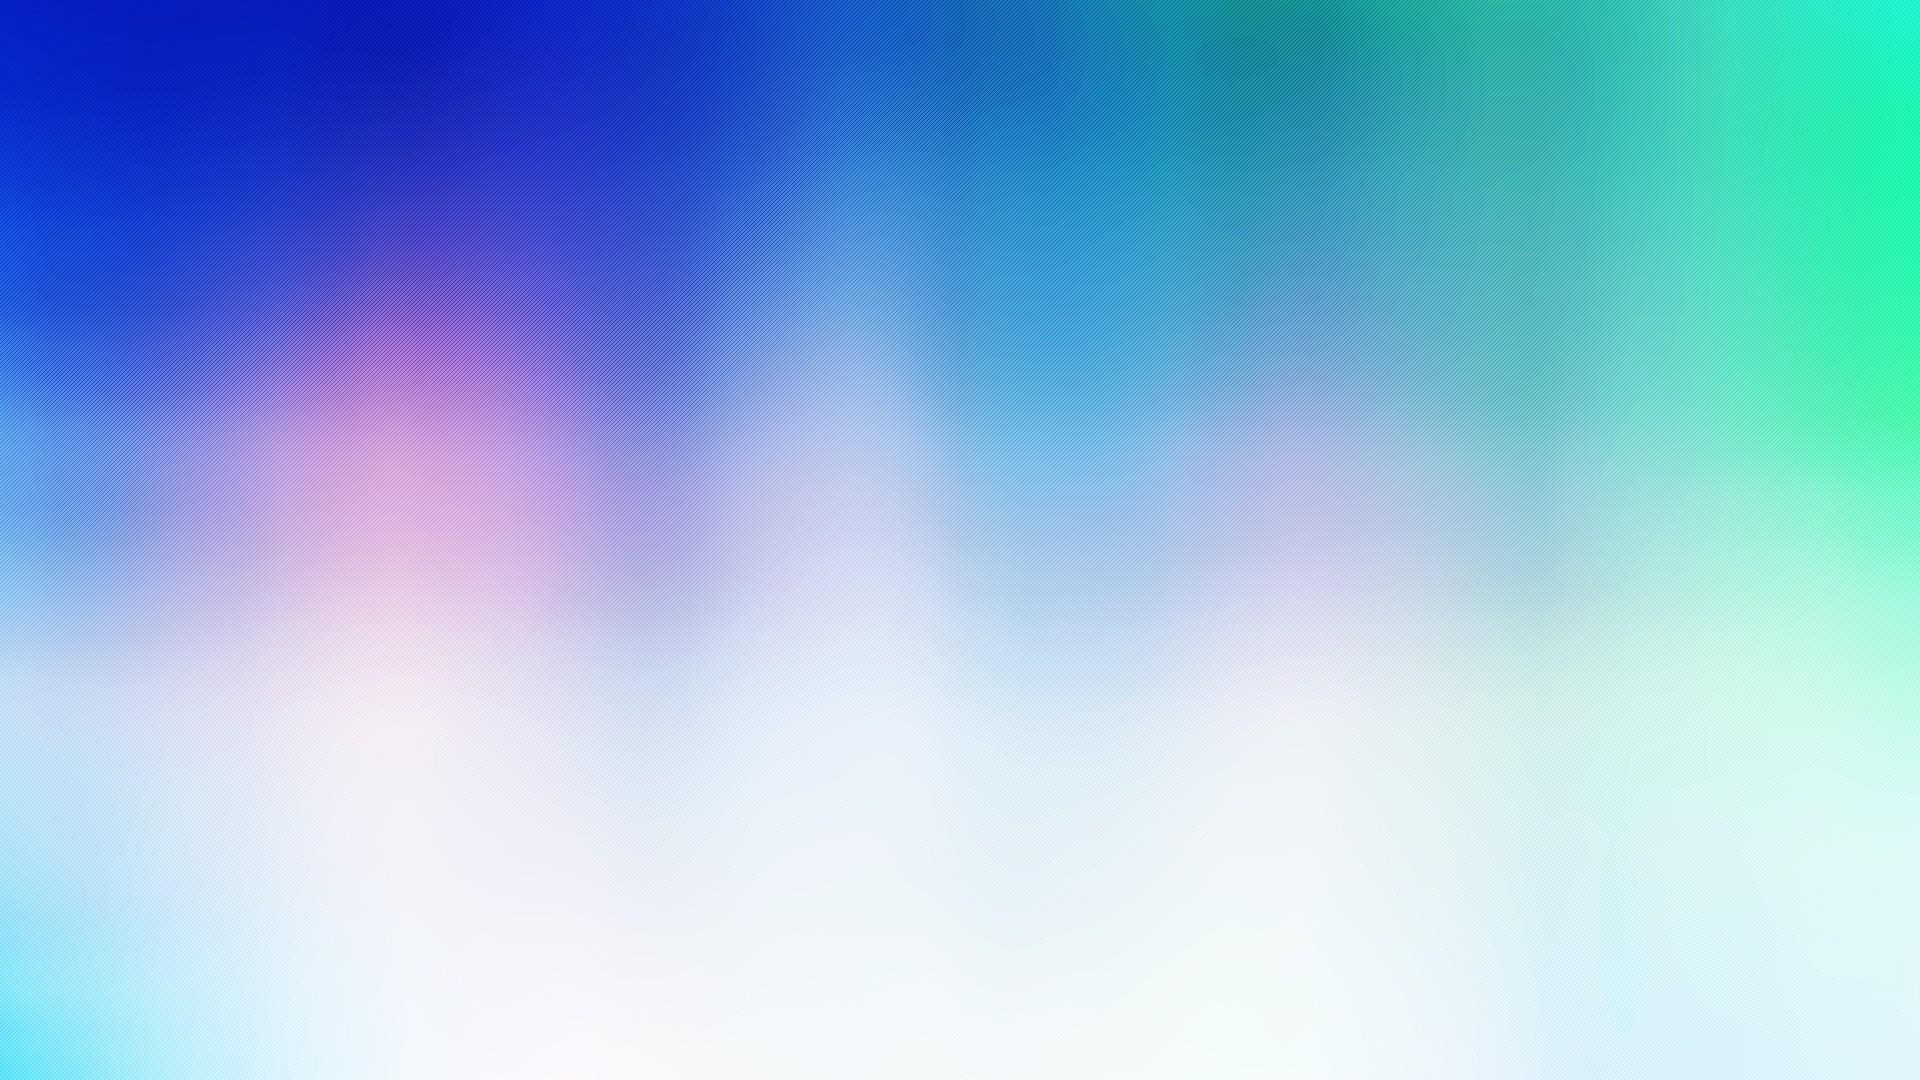 Wallpaper Sunlight Sky Blue Circle Lens Flare Light